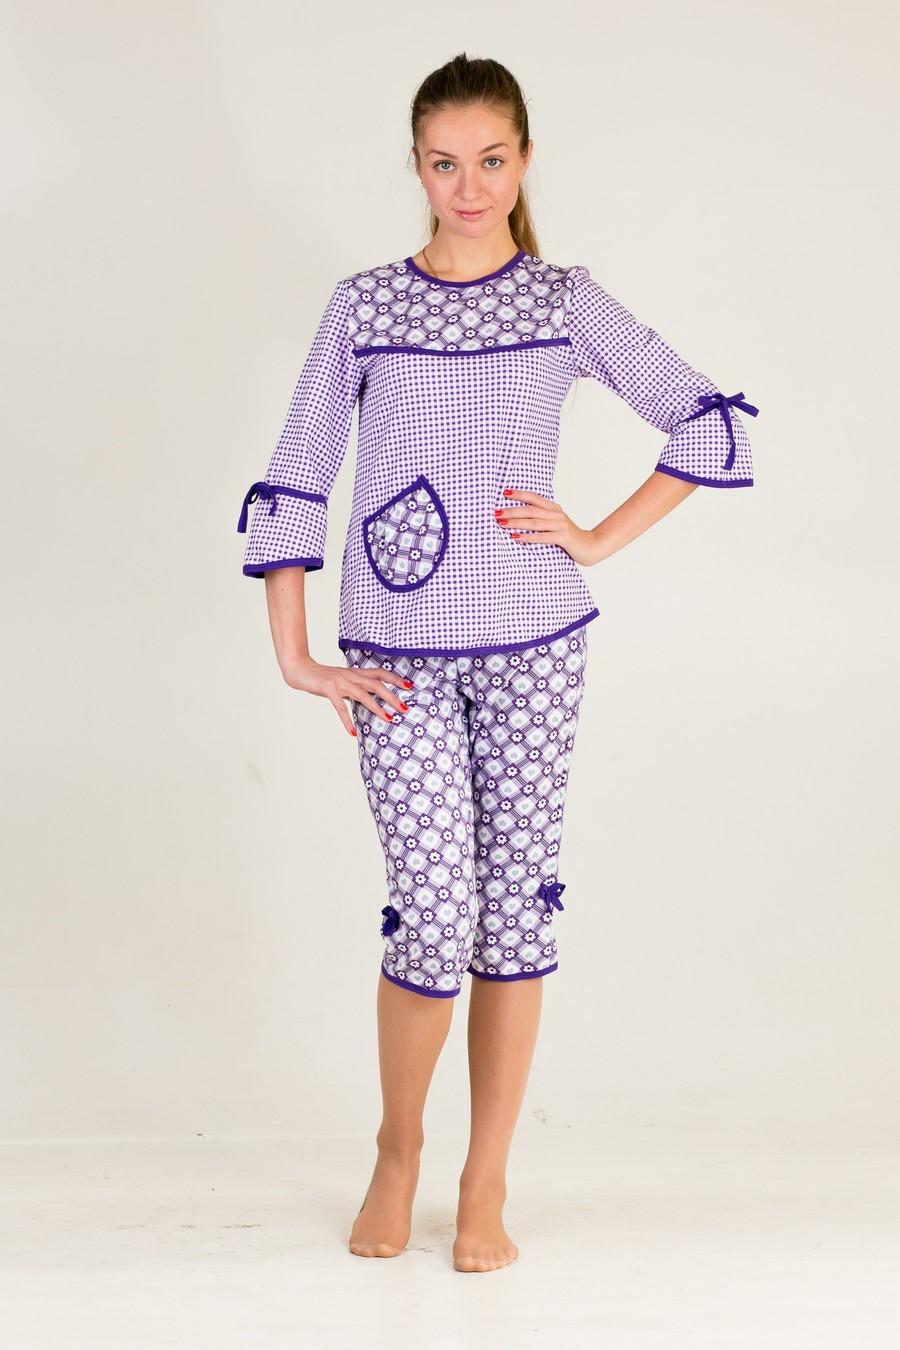 Пижама Катя Фиолет кофта+бриджиДомашняя одежда<br><br><br>Размер: 50